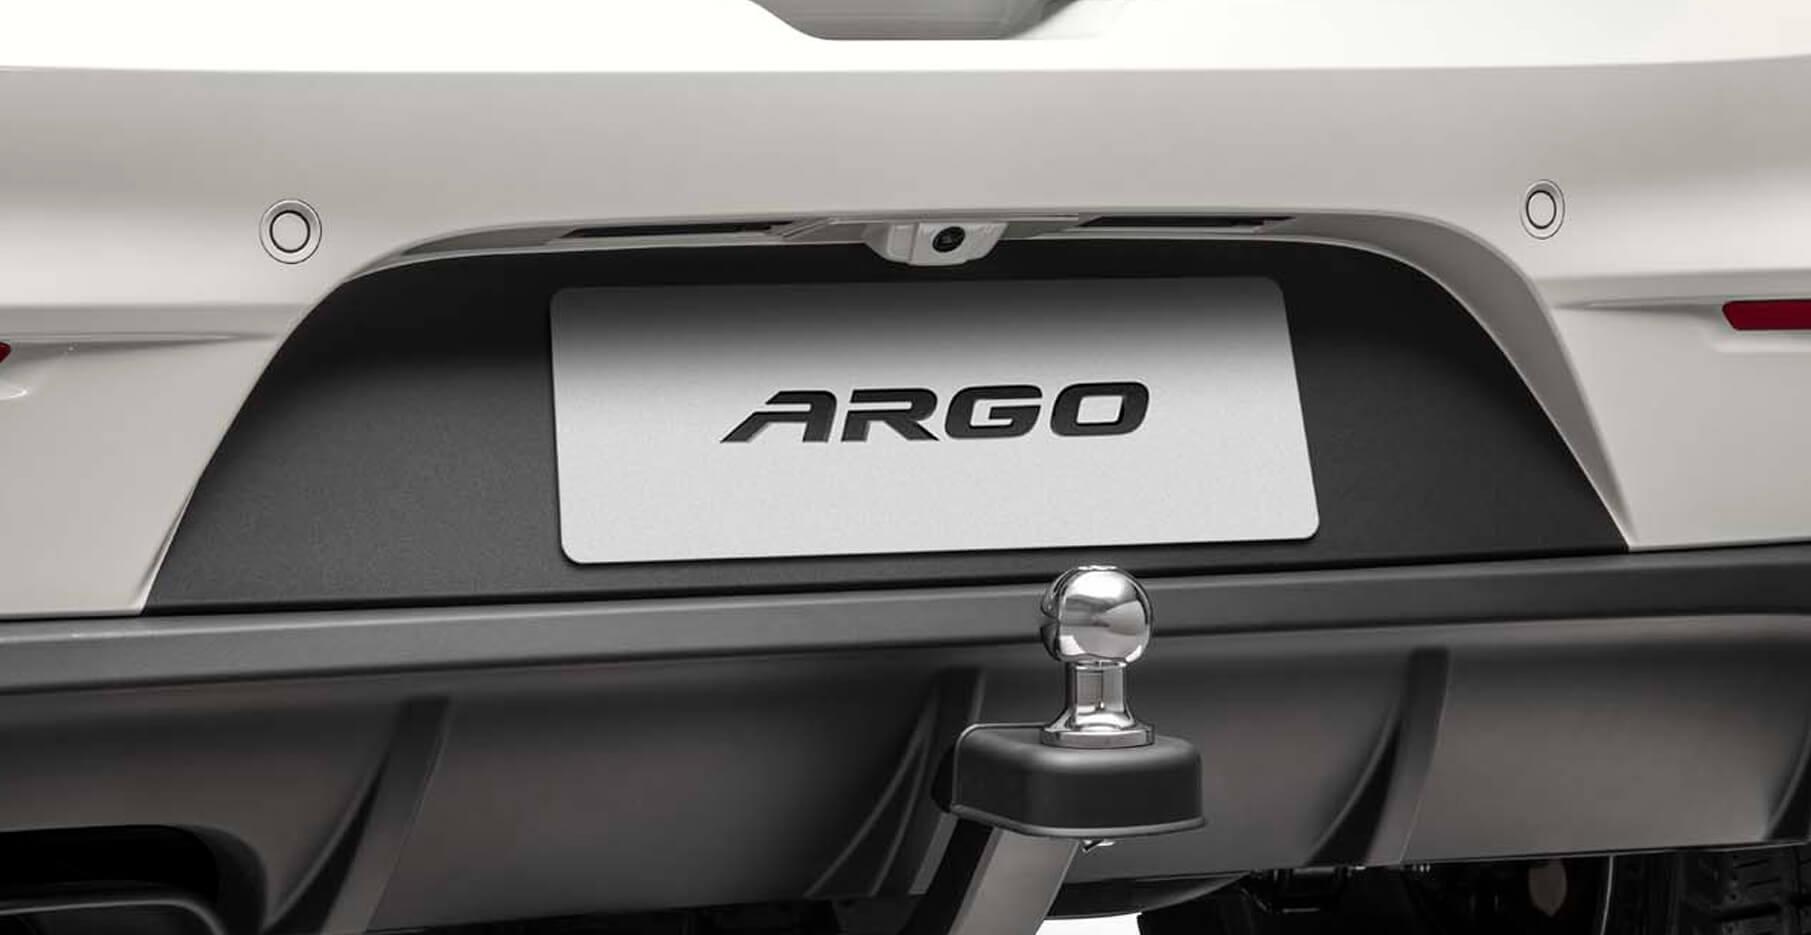 Carros Novos Argo Trekking Argo Trekking San Marino Fiat